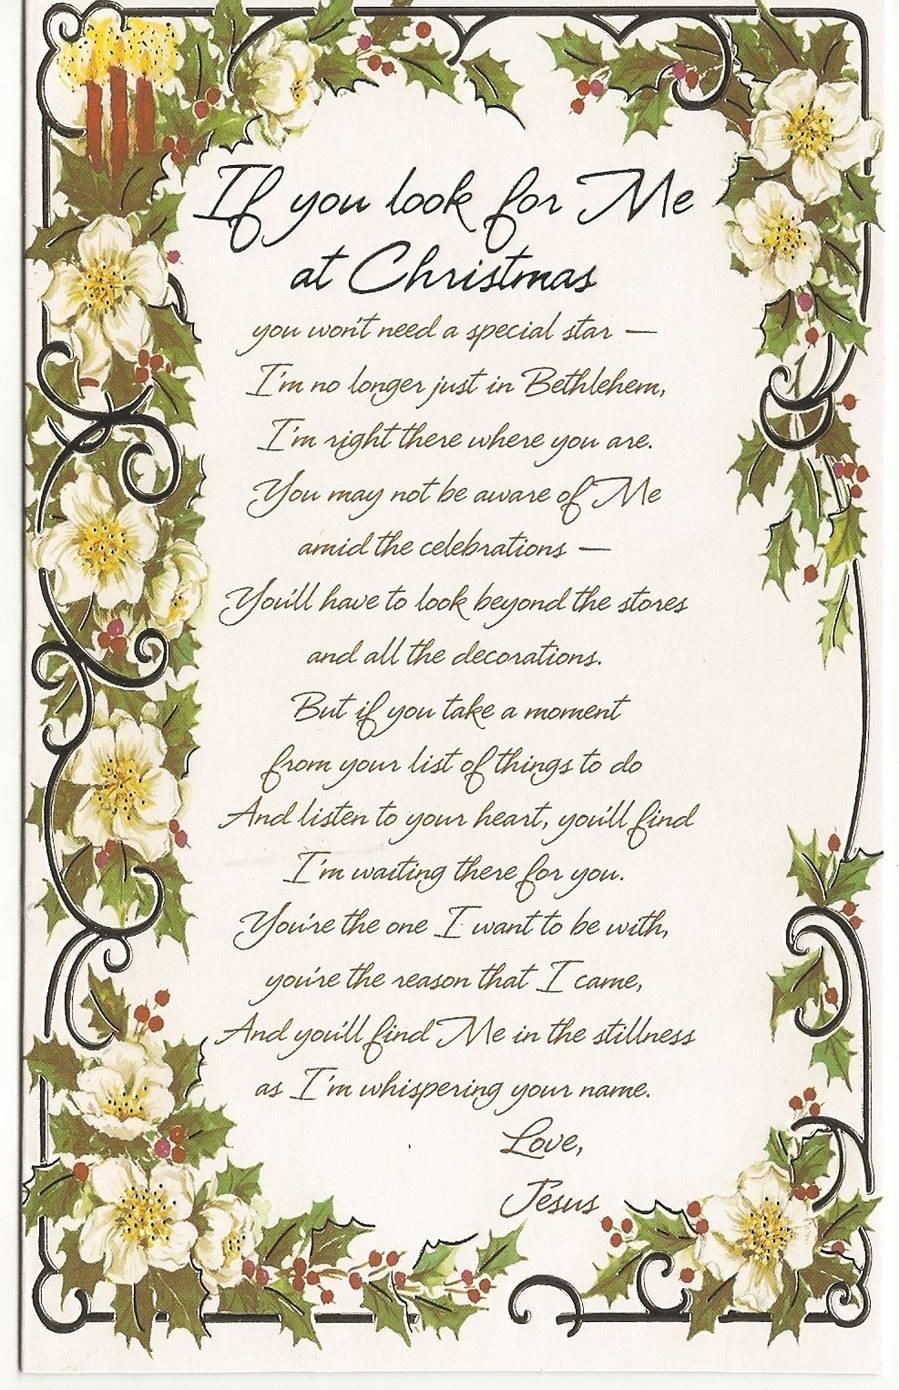 Jesus Christmas Card | Lighthouse Ministries